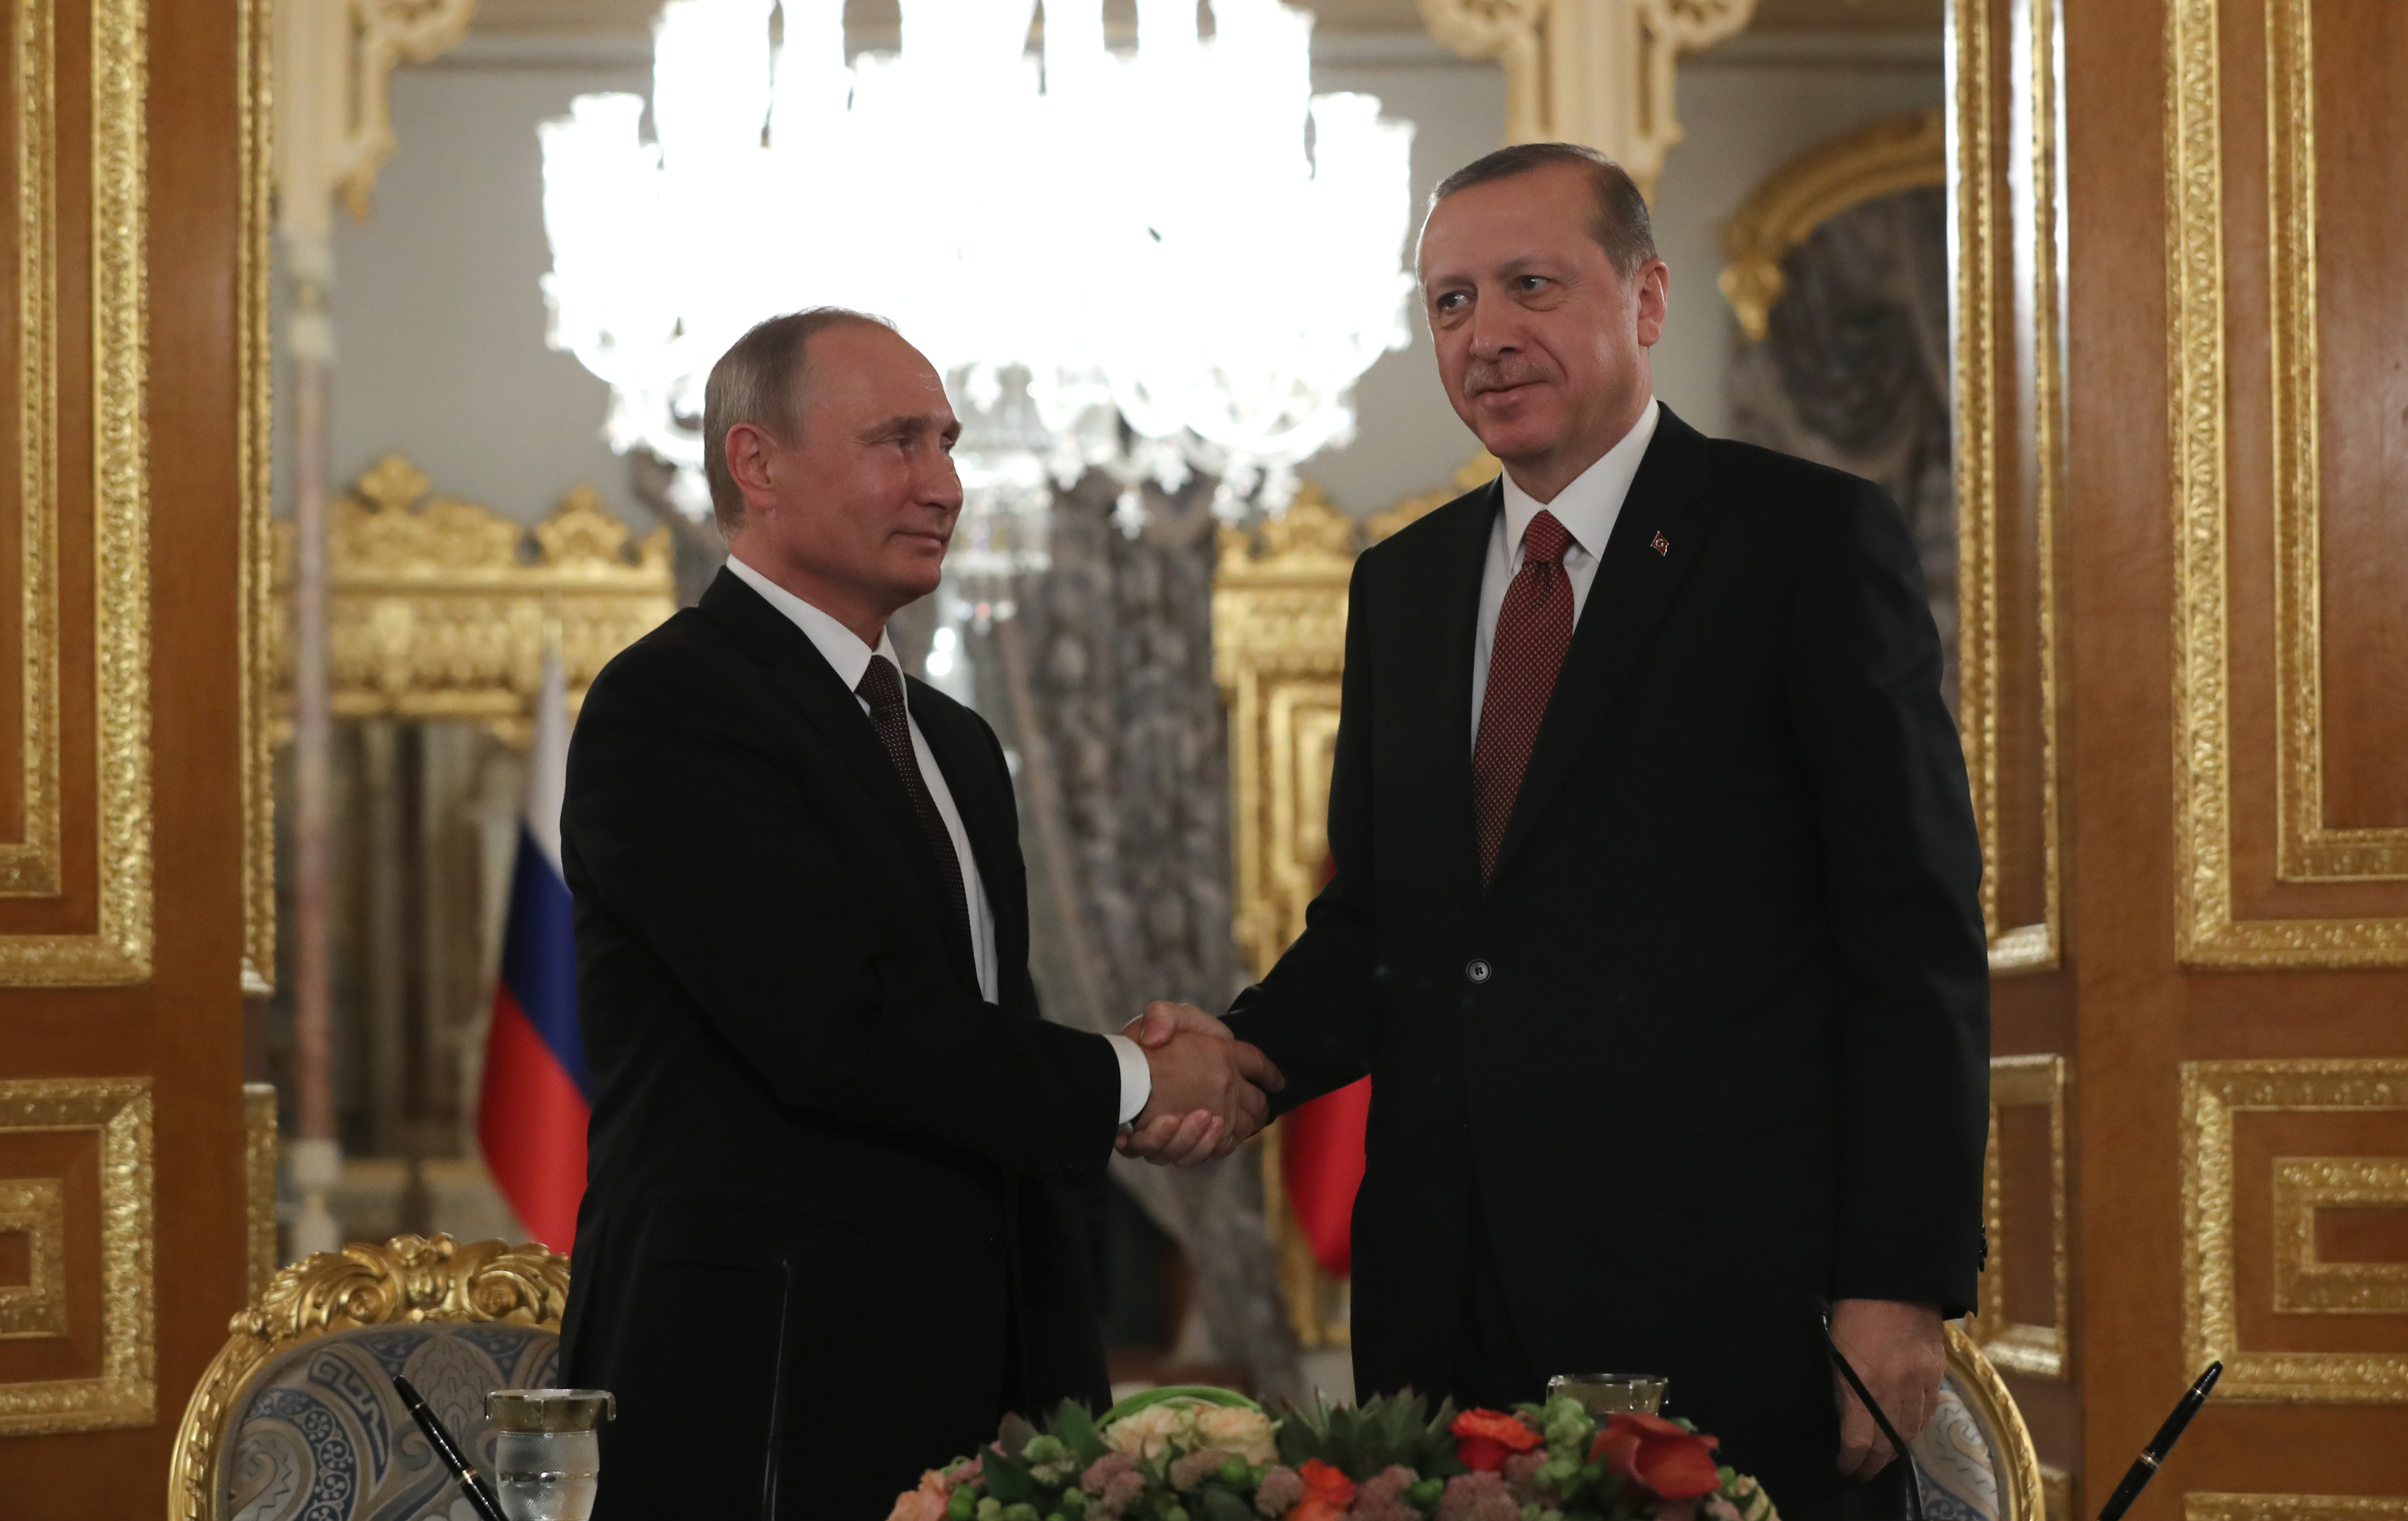 Владимир Путин и Реджеп Тайип Эрдоган Фото: EPA